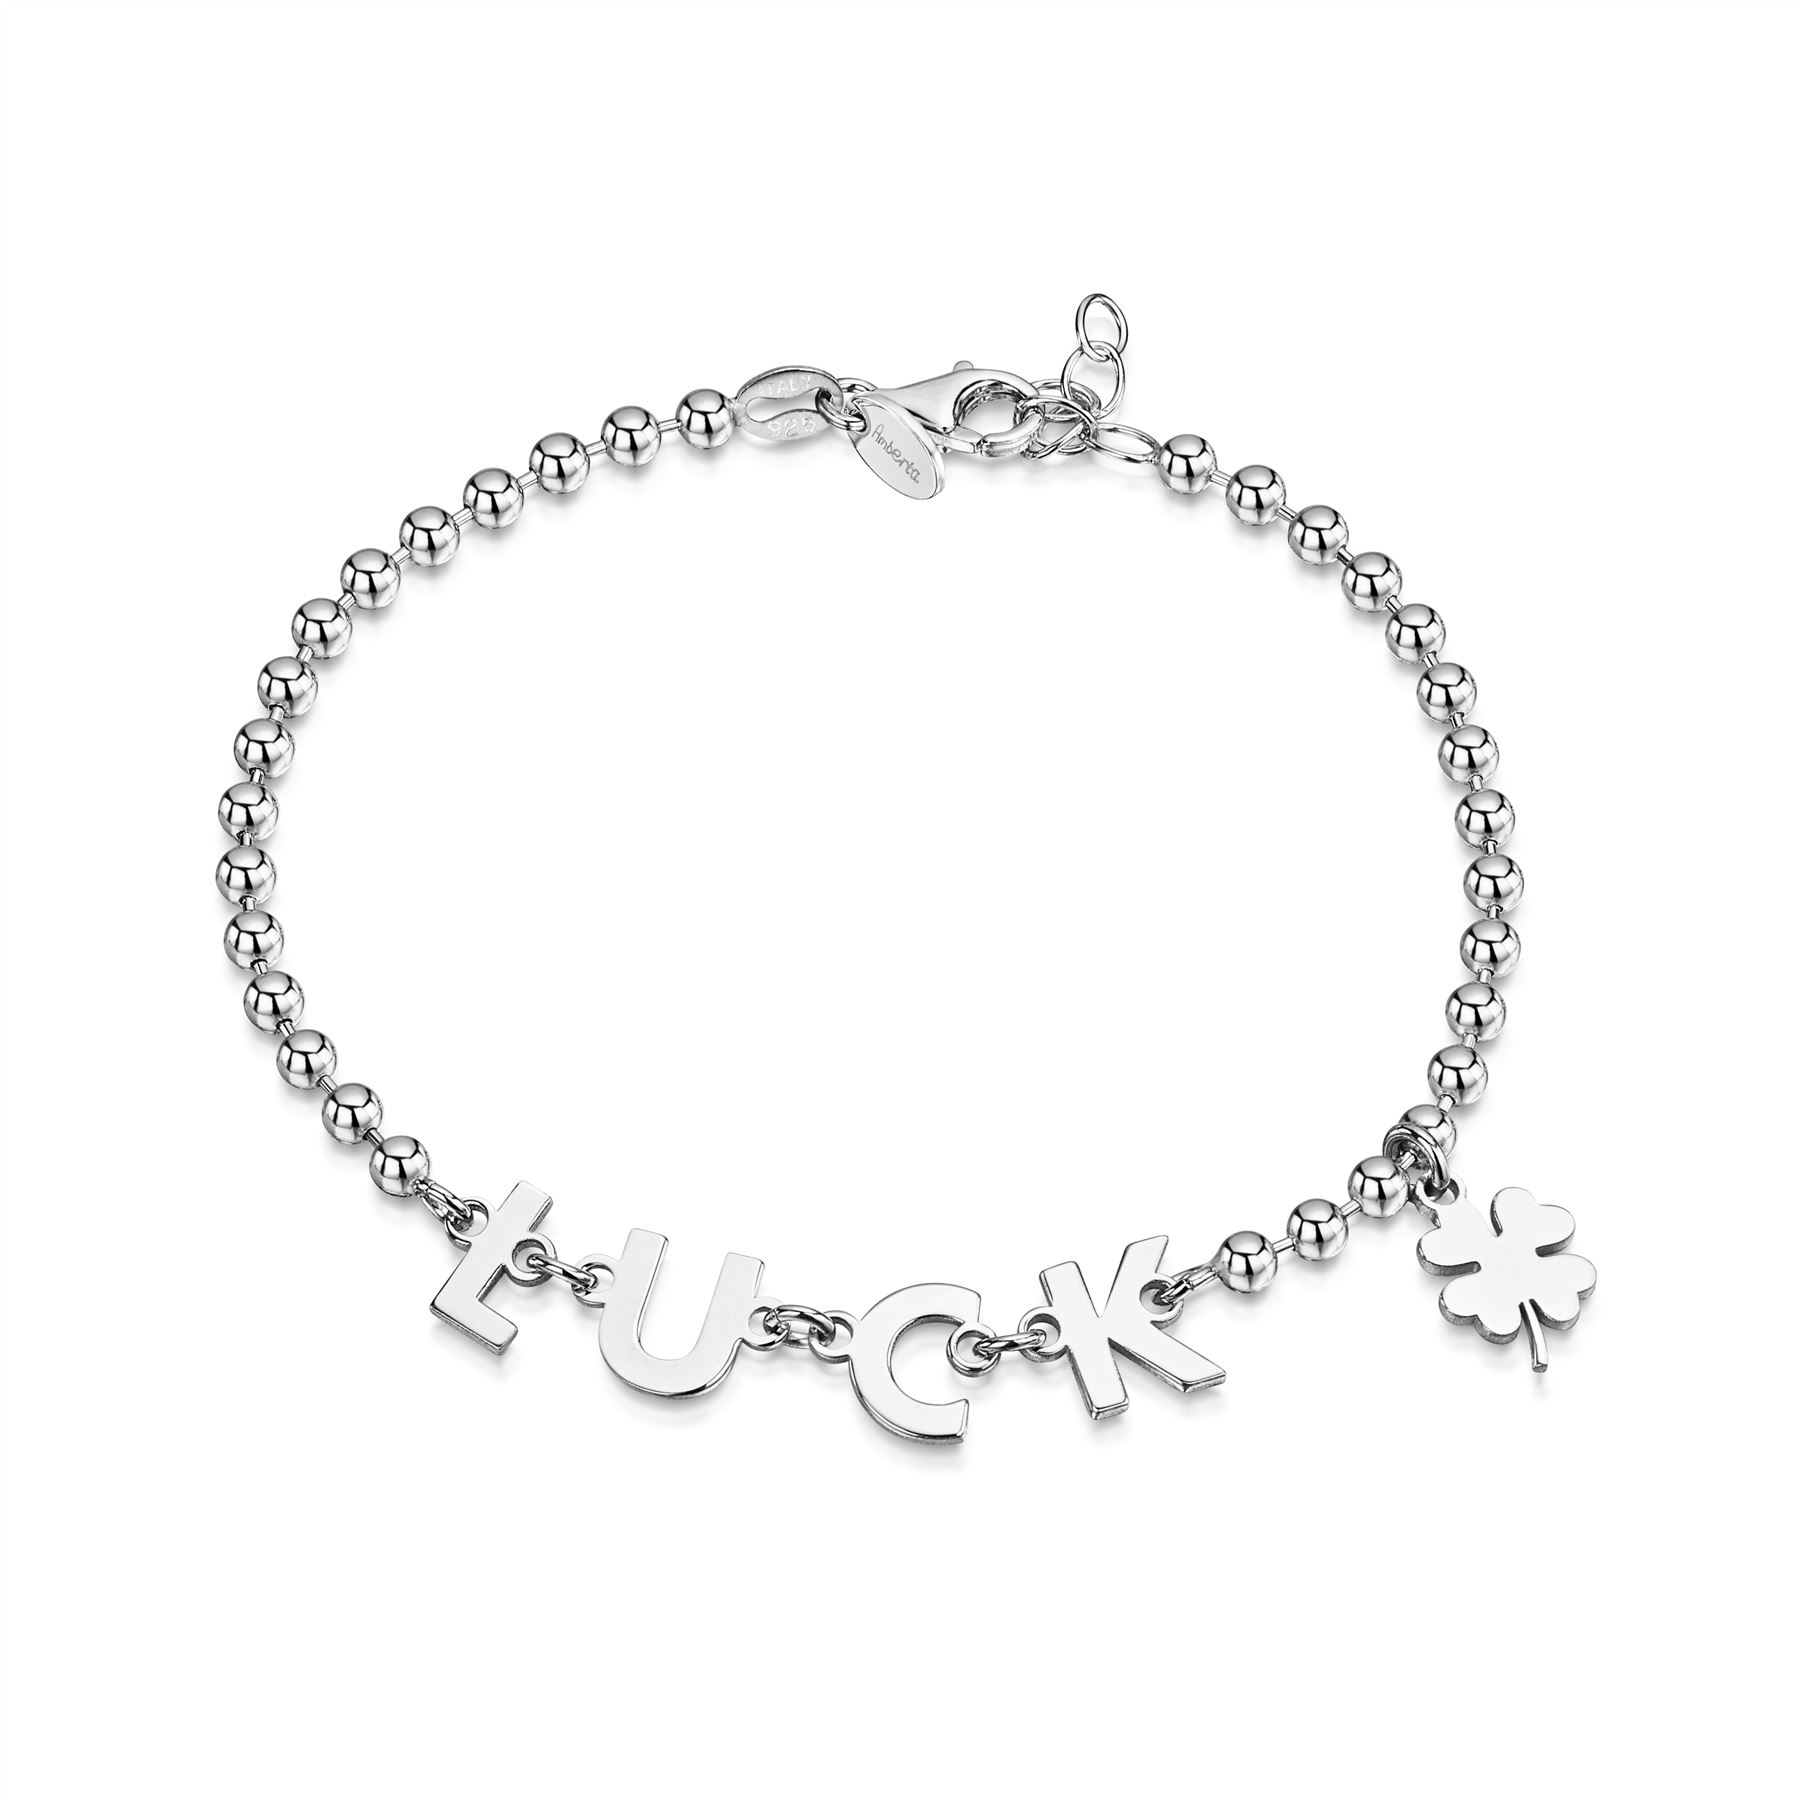 Amberta-Jewelry-925-Sterling-Silver-Adjustable-Bracelet-Italian-Bangle-for-Women thumbnail 85